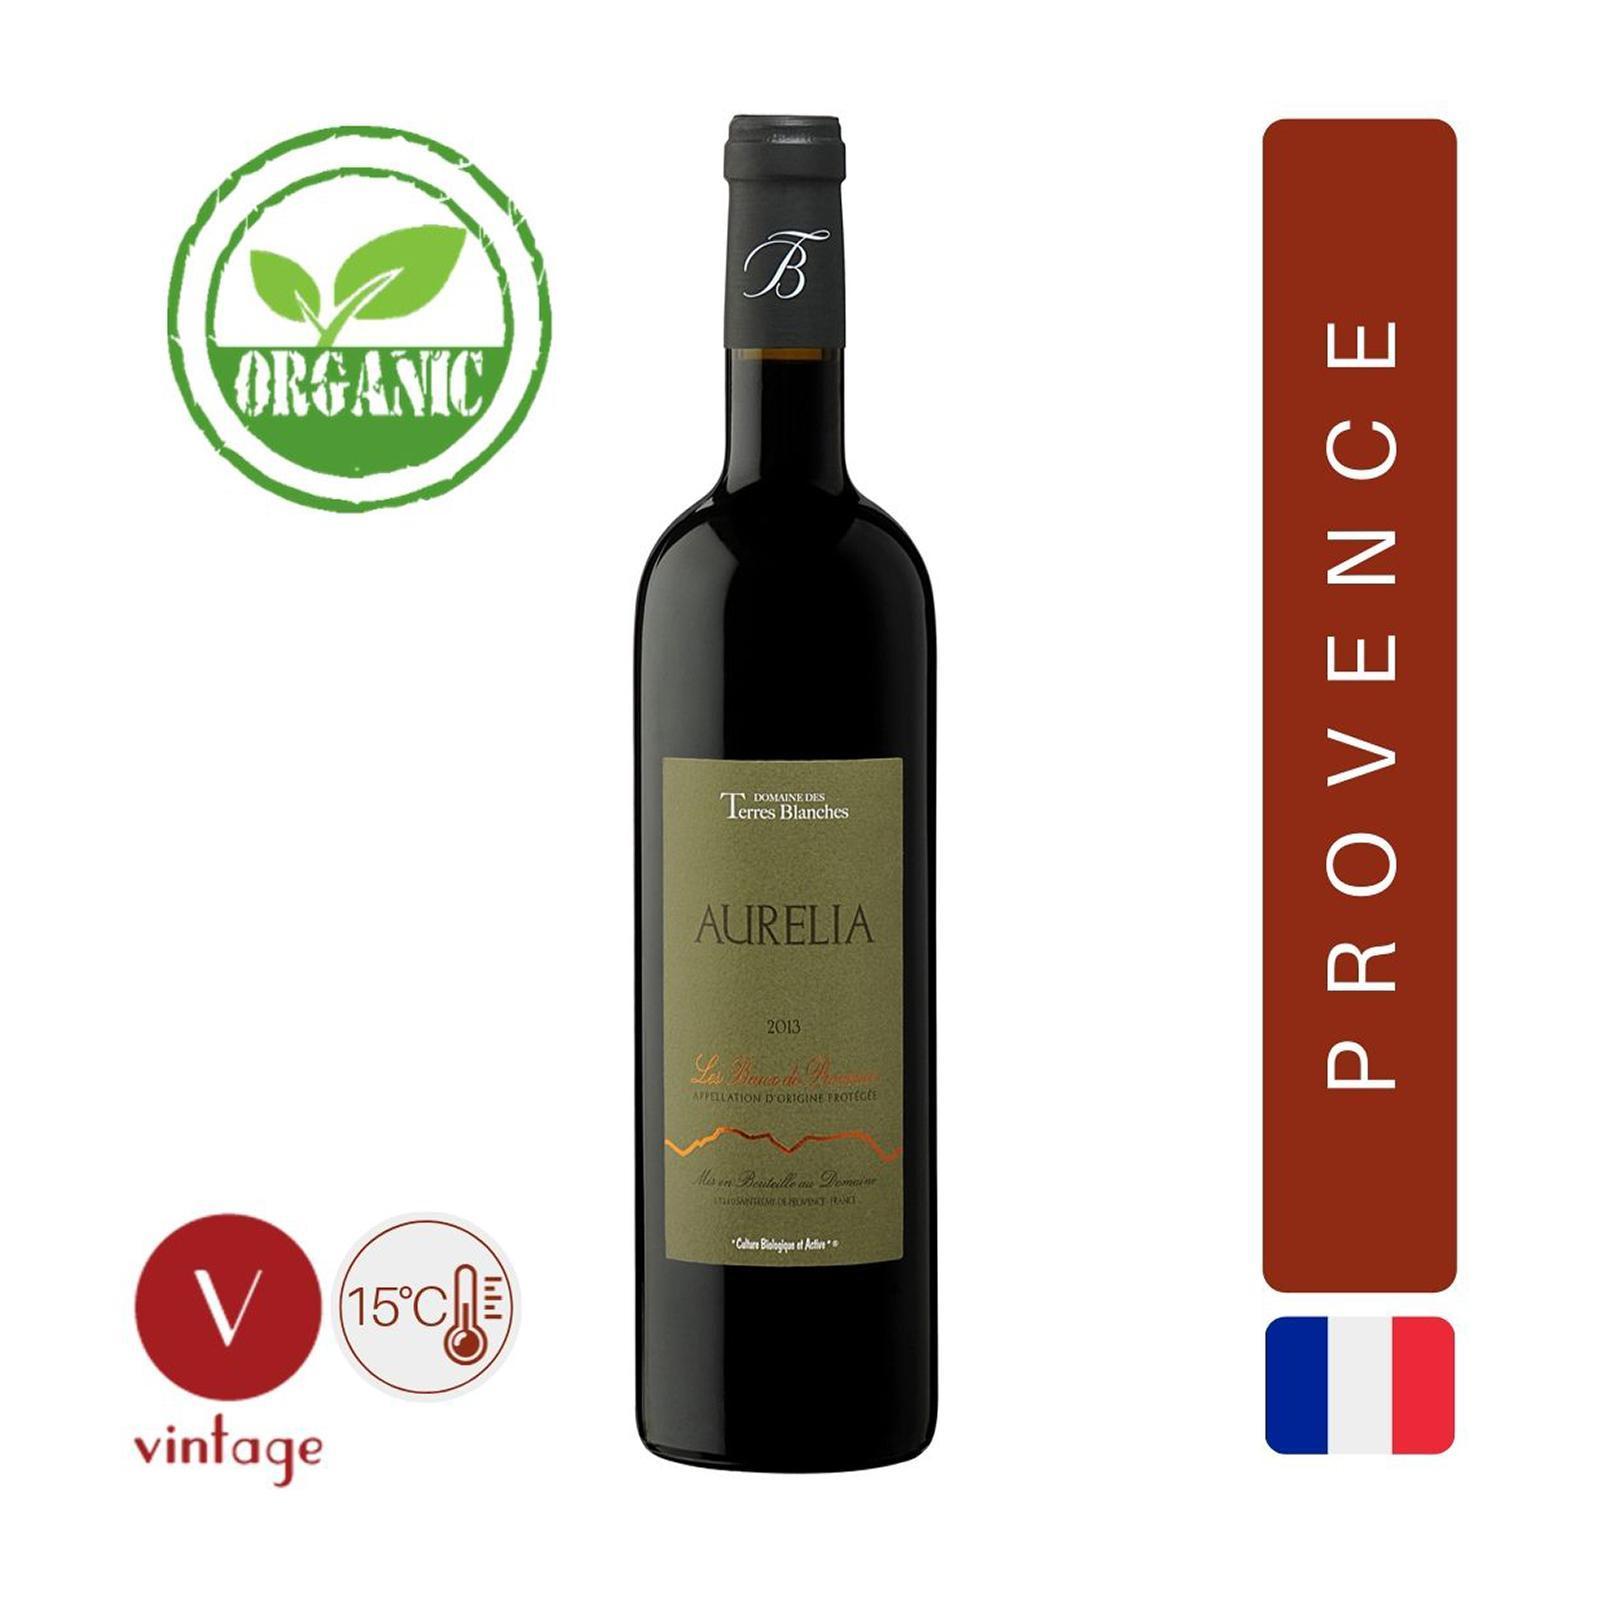 Domaine des Terres Blanches Aurelia - Provence Red Wine